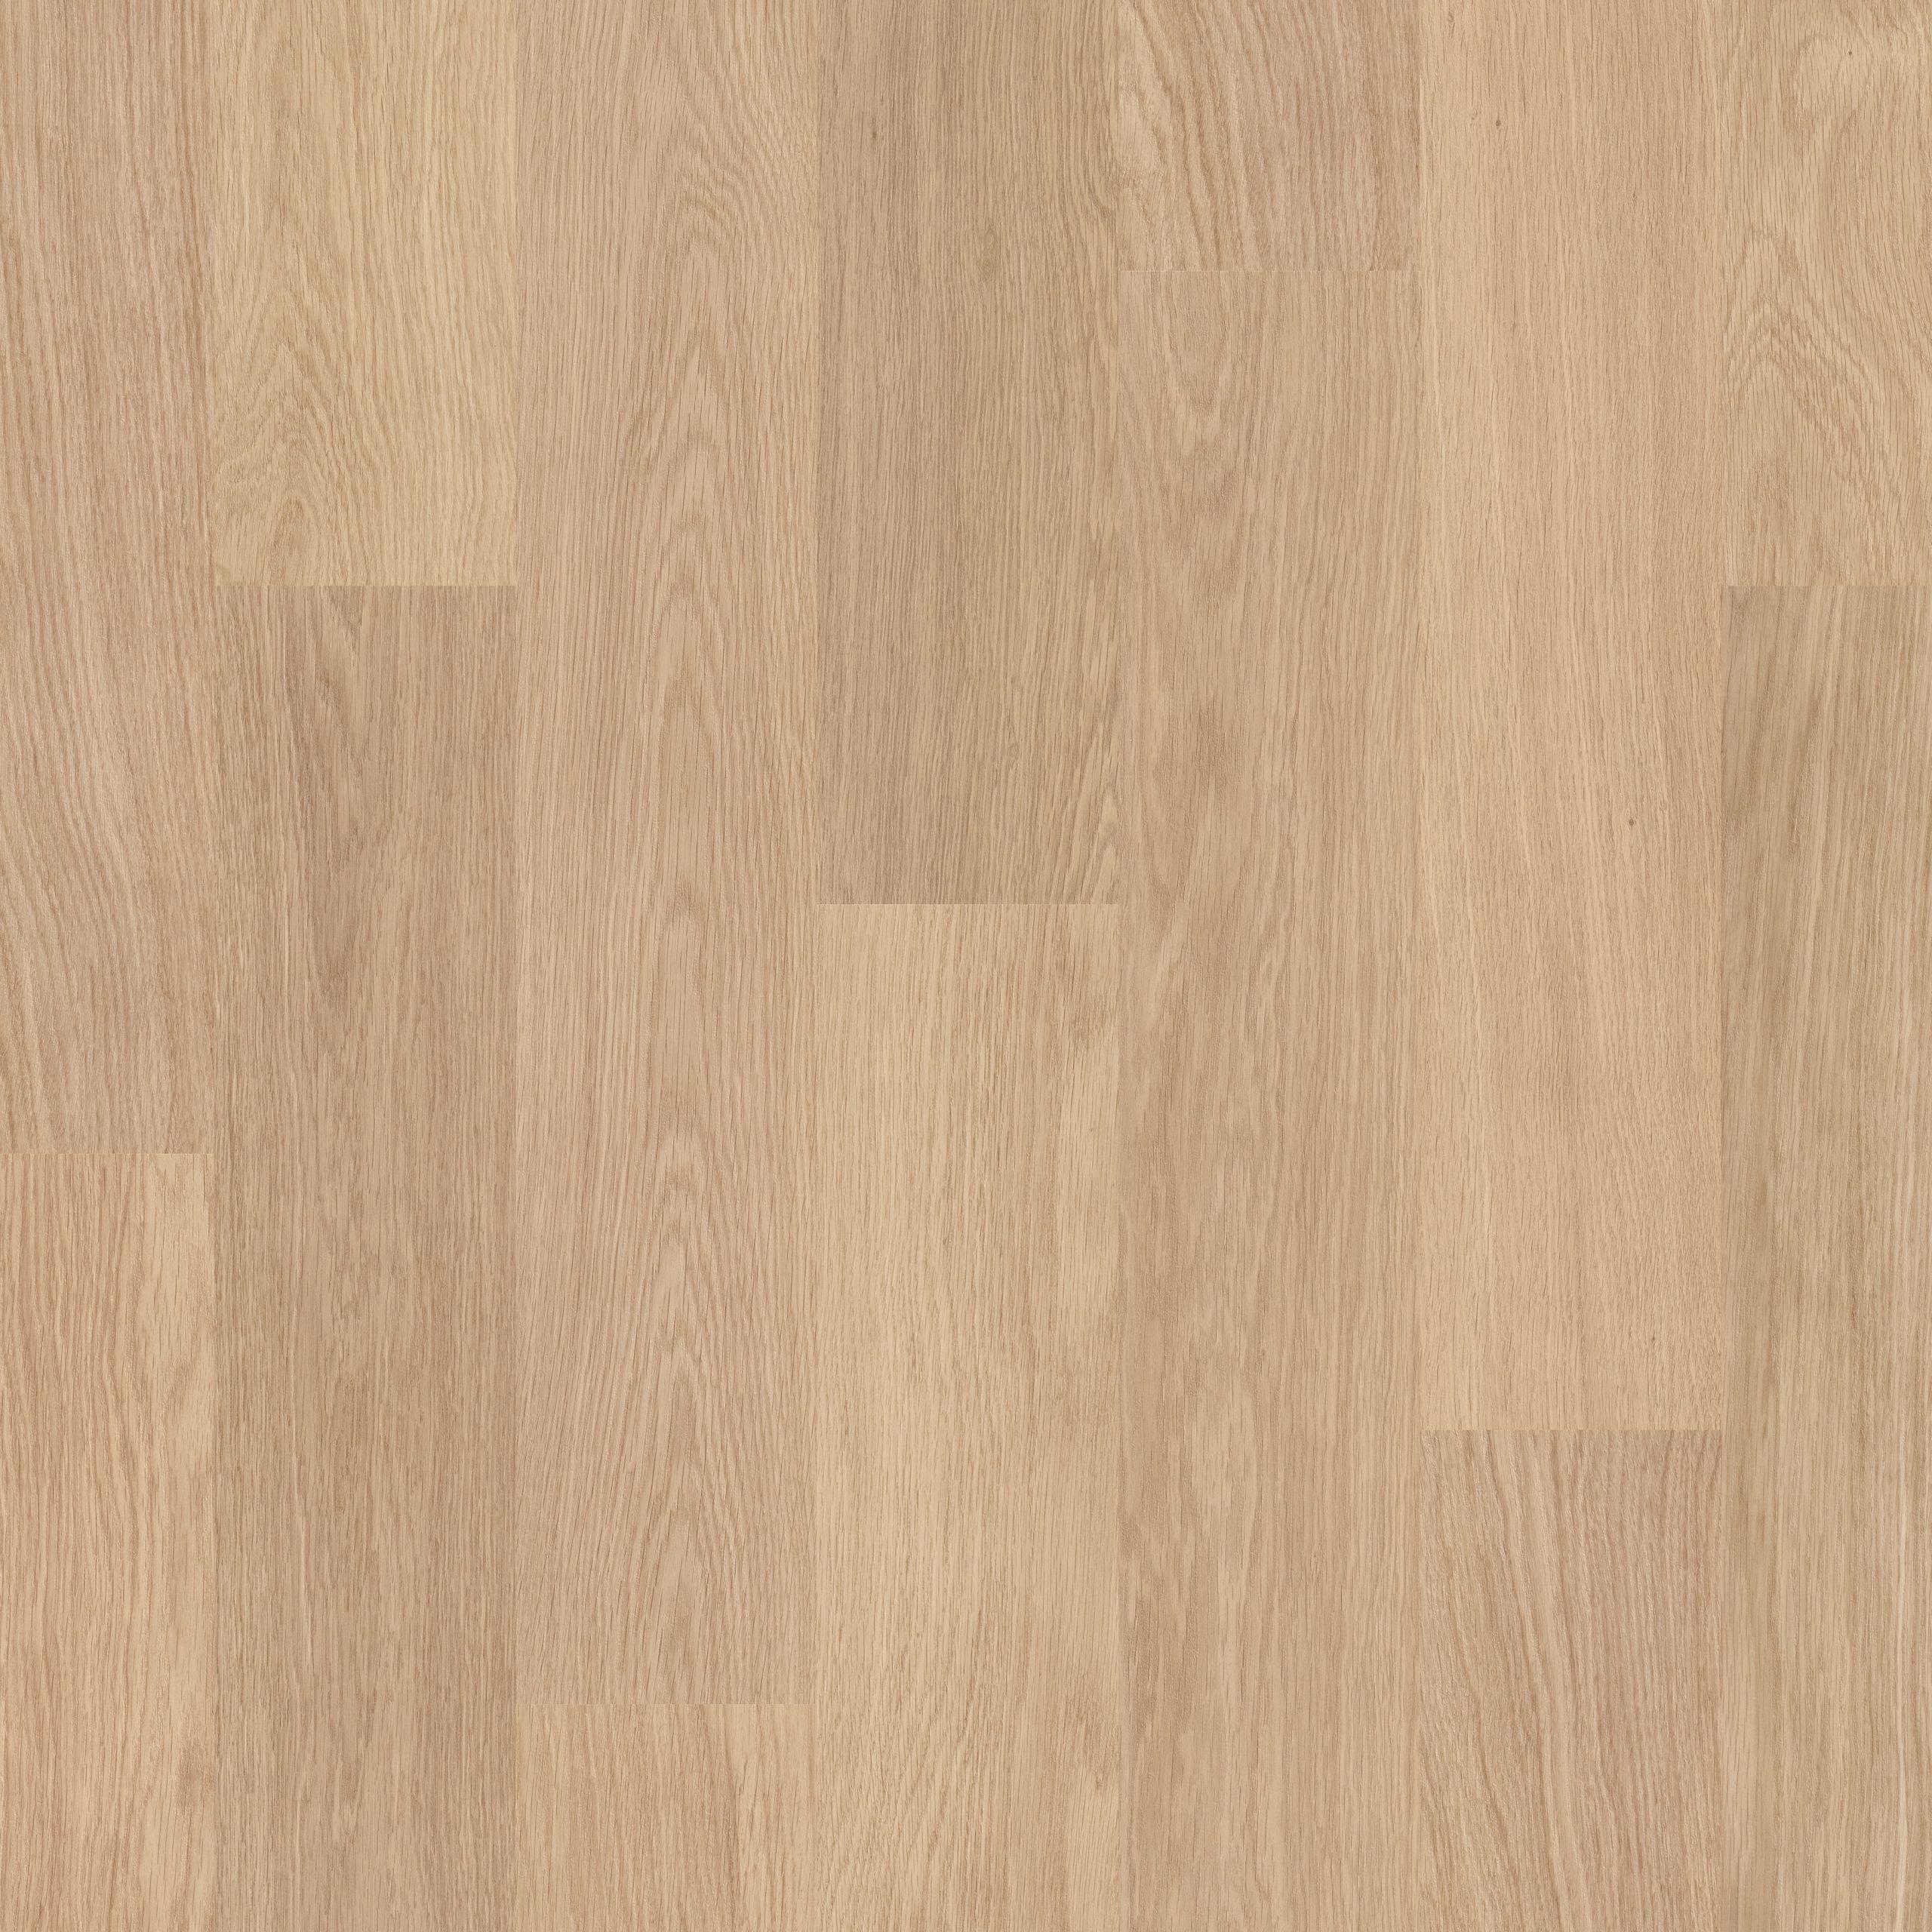 EL915_Topshot-Square HR